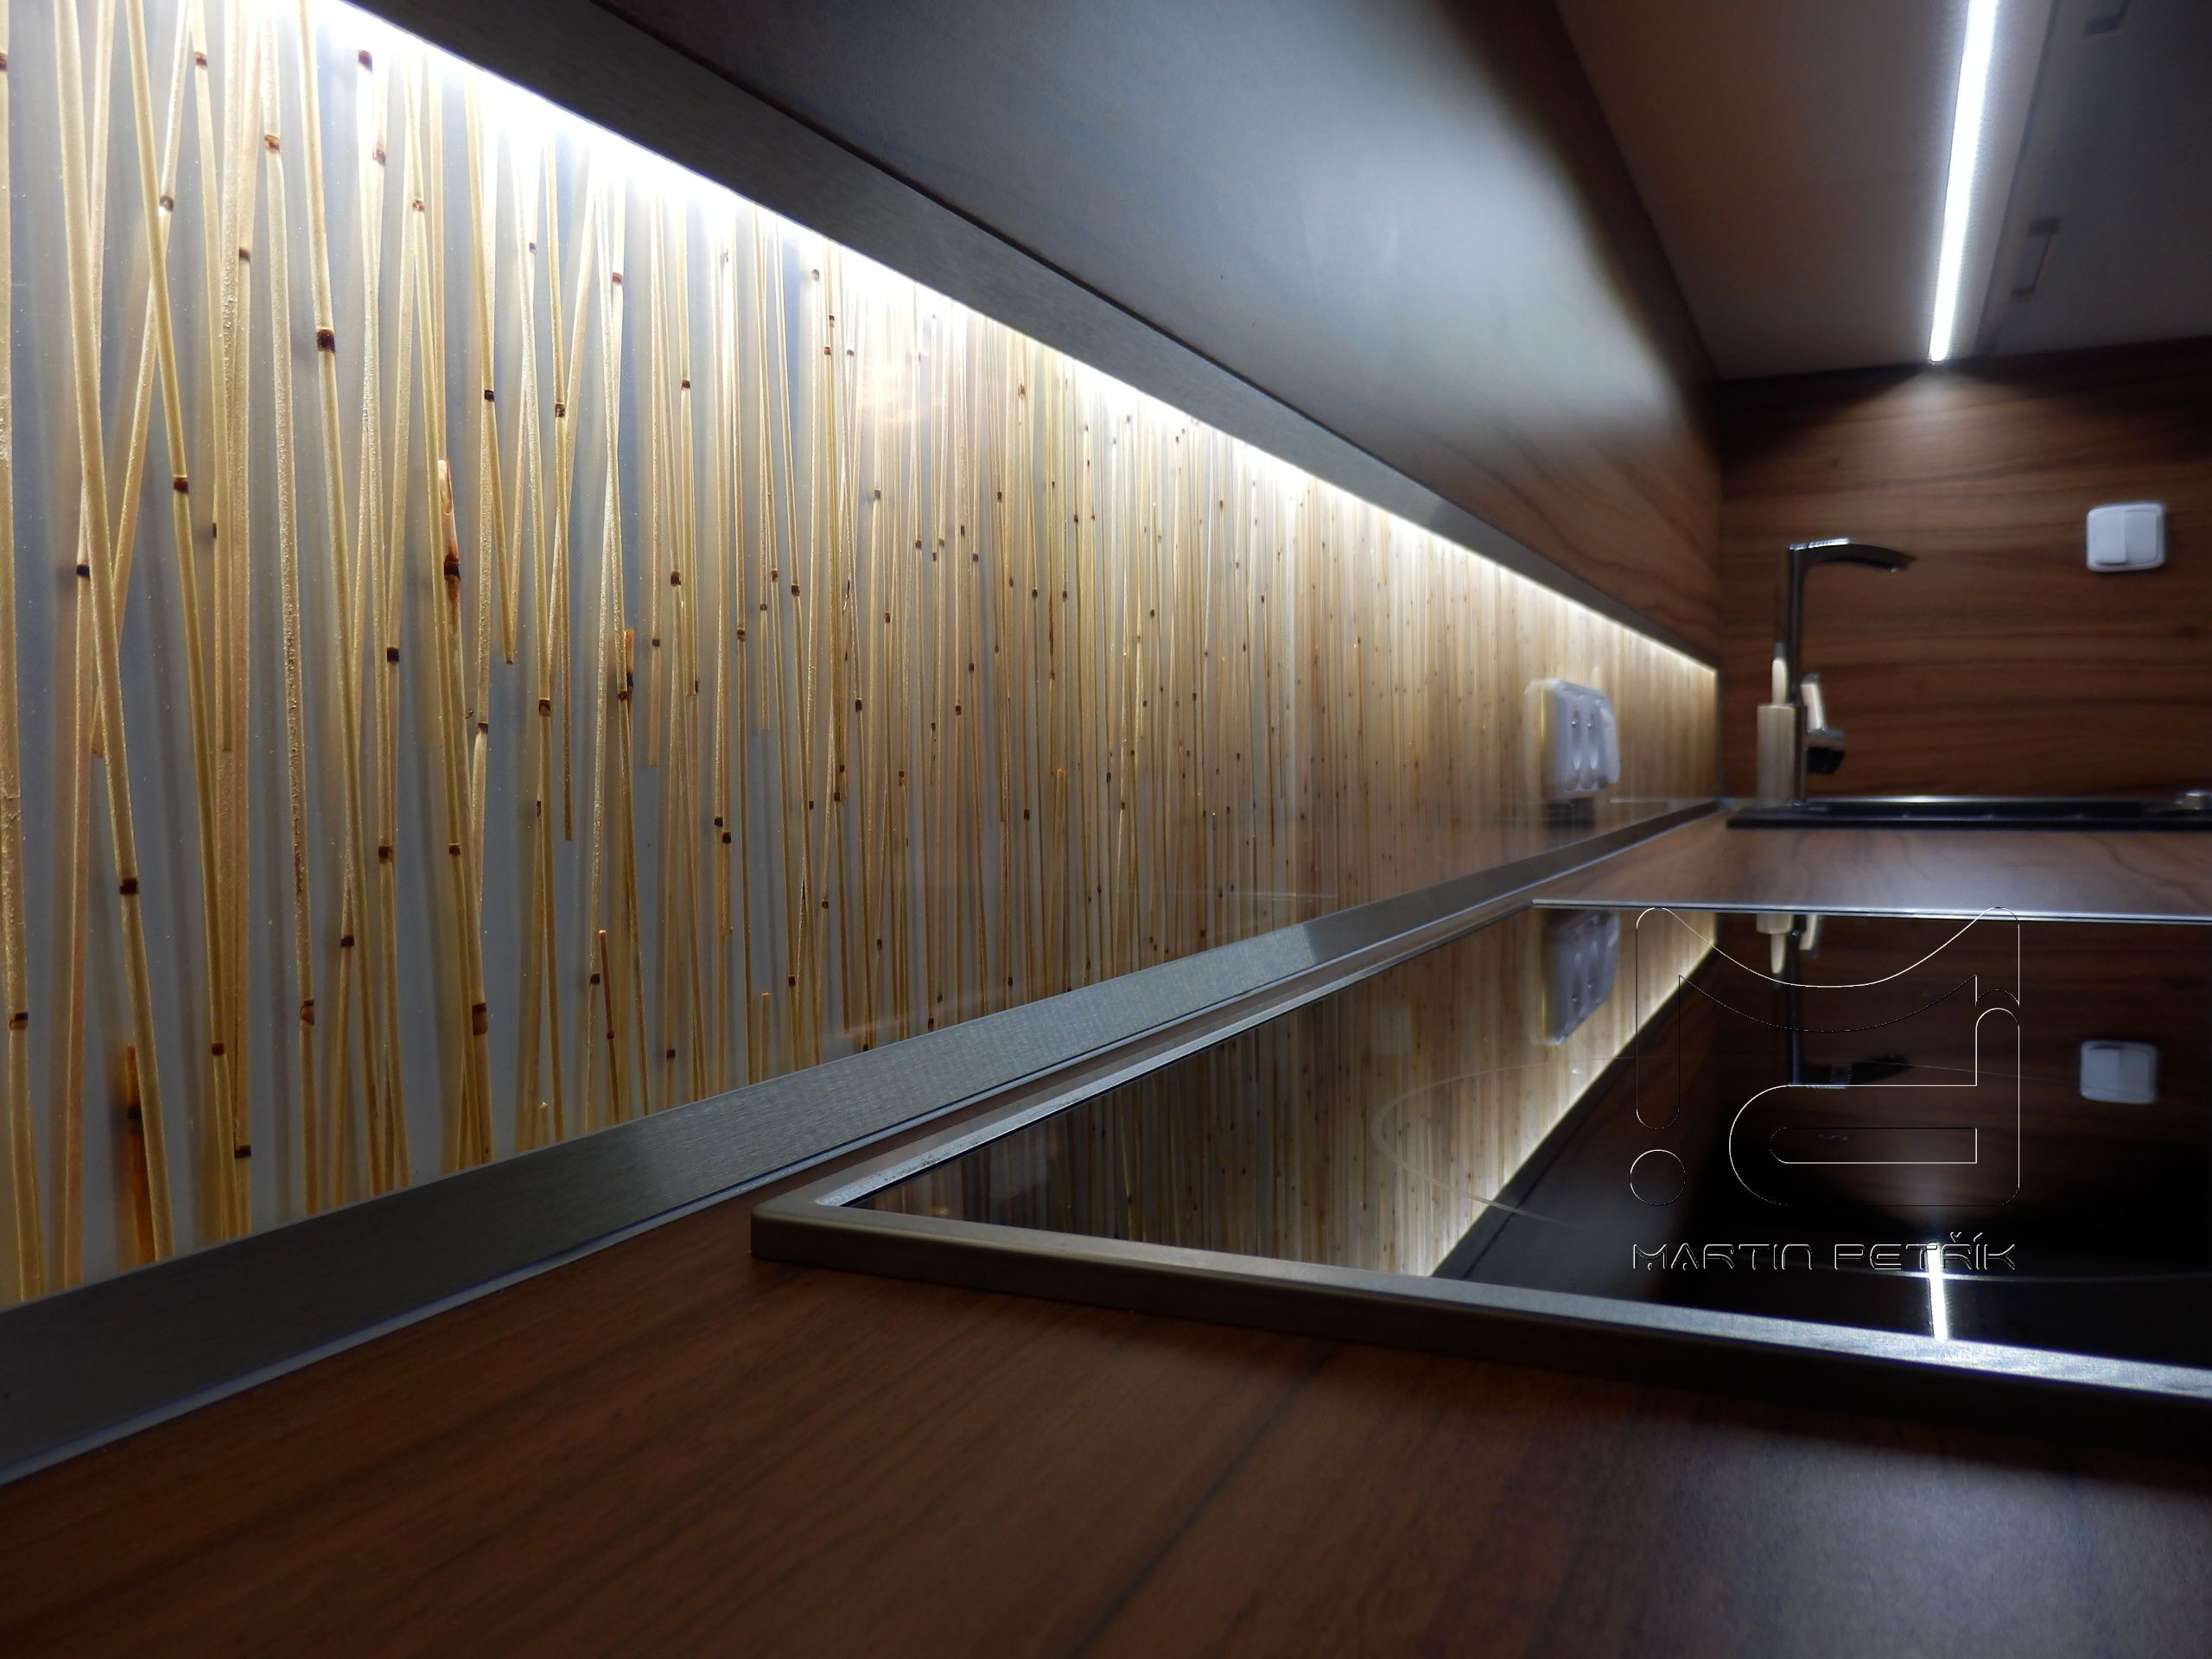 Back Splash Tiles With Organic Brown Bamboo Resin Acrylic Panel Panels Dekorakryl Kitchen Acrylic Wall Panels Interior Architecture Design Copper Tiles